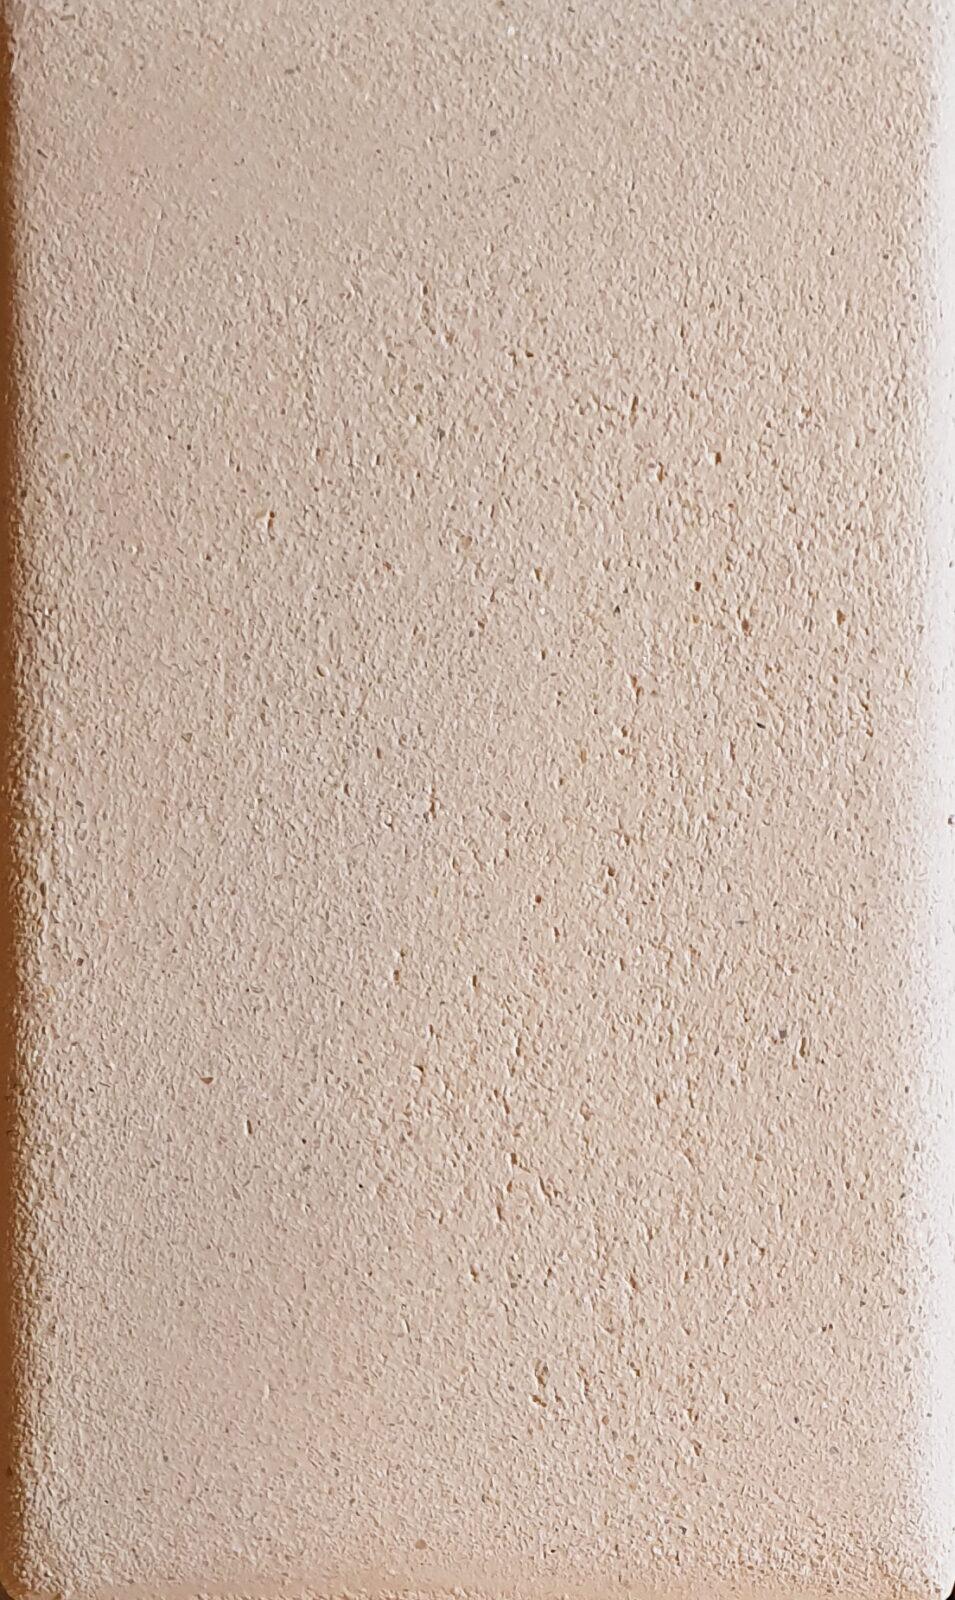 Djenne Finish 8% kleurleem leemstuc Tierrafino